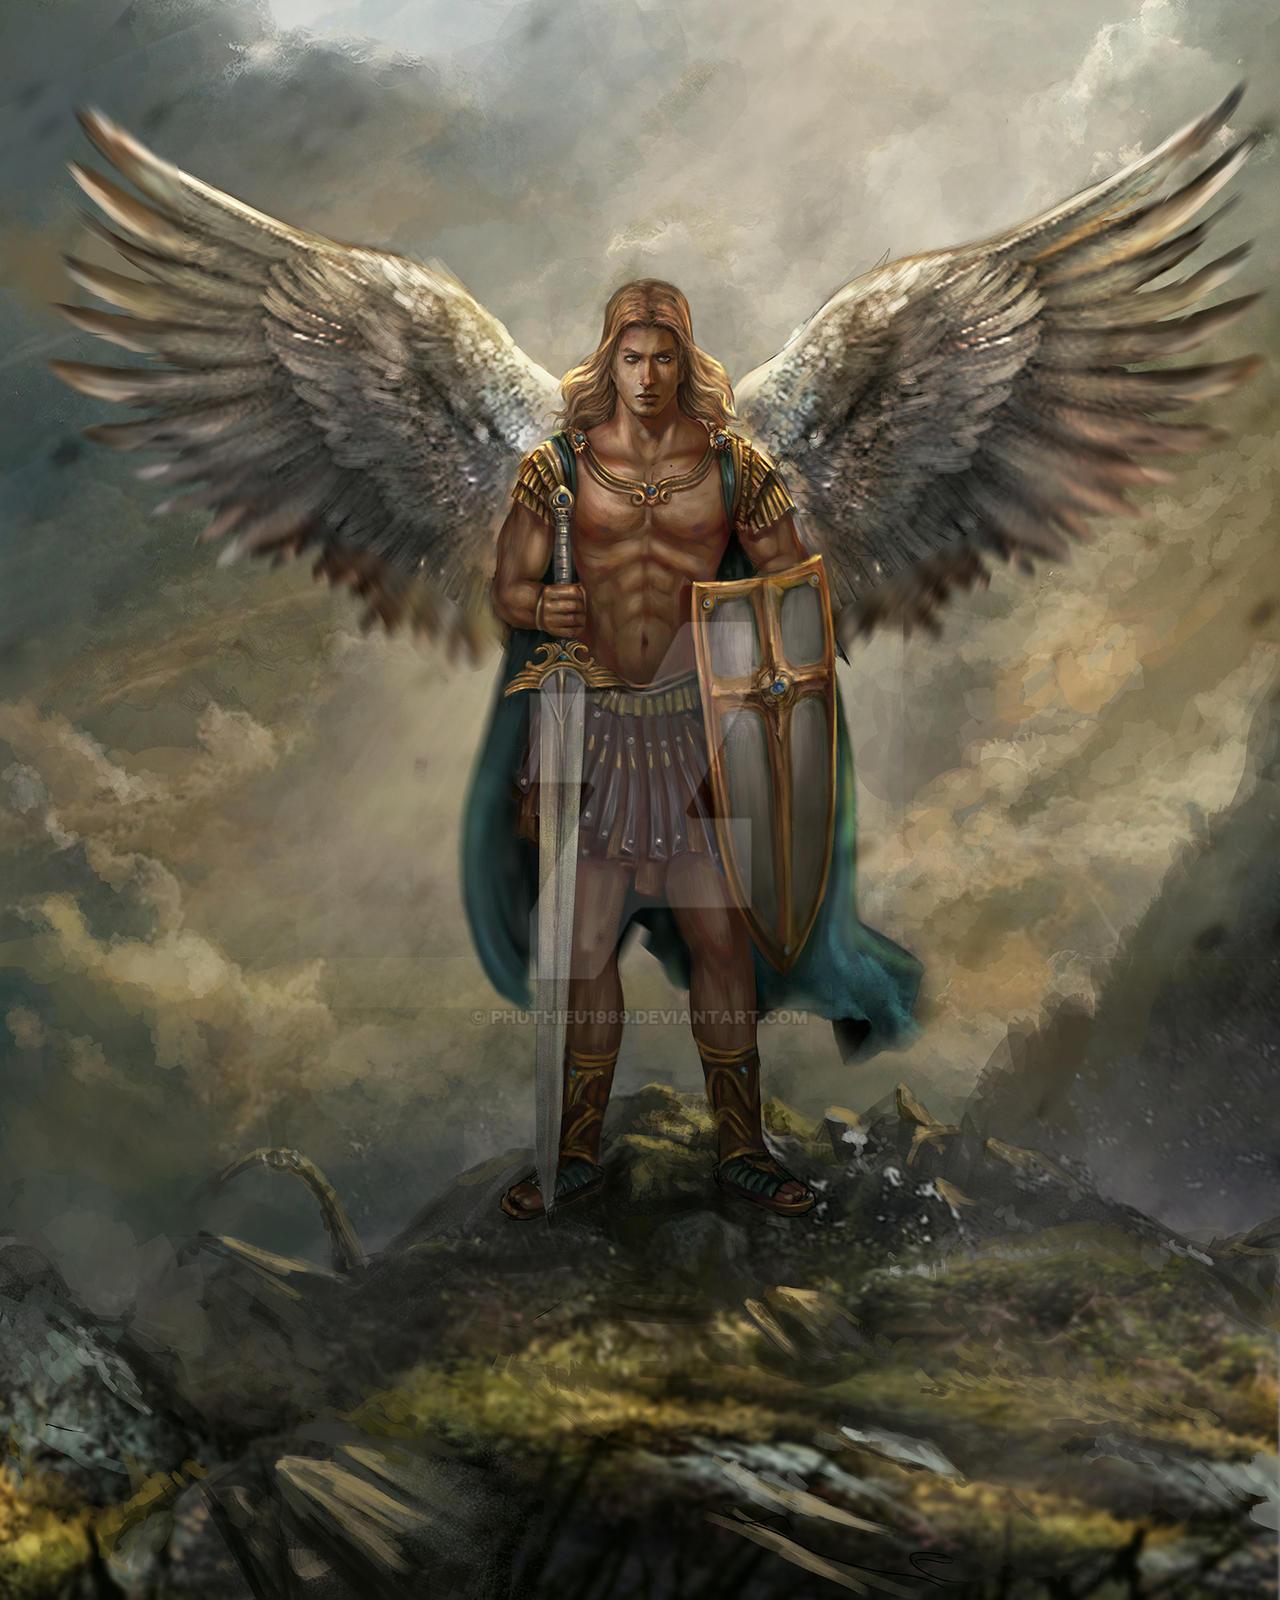 Archangel-Michale by PhuThieu1989 on DeviantArt